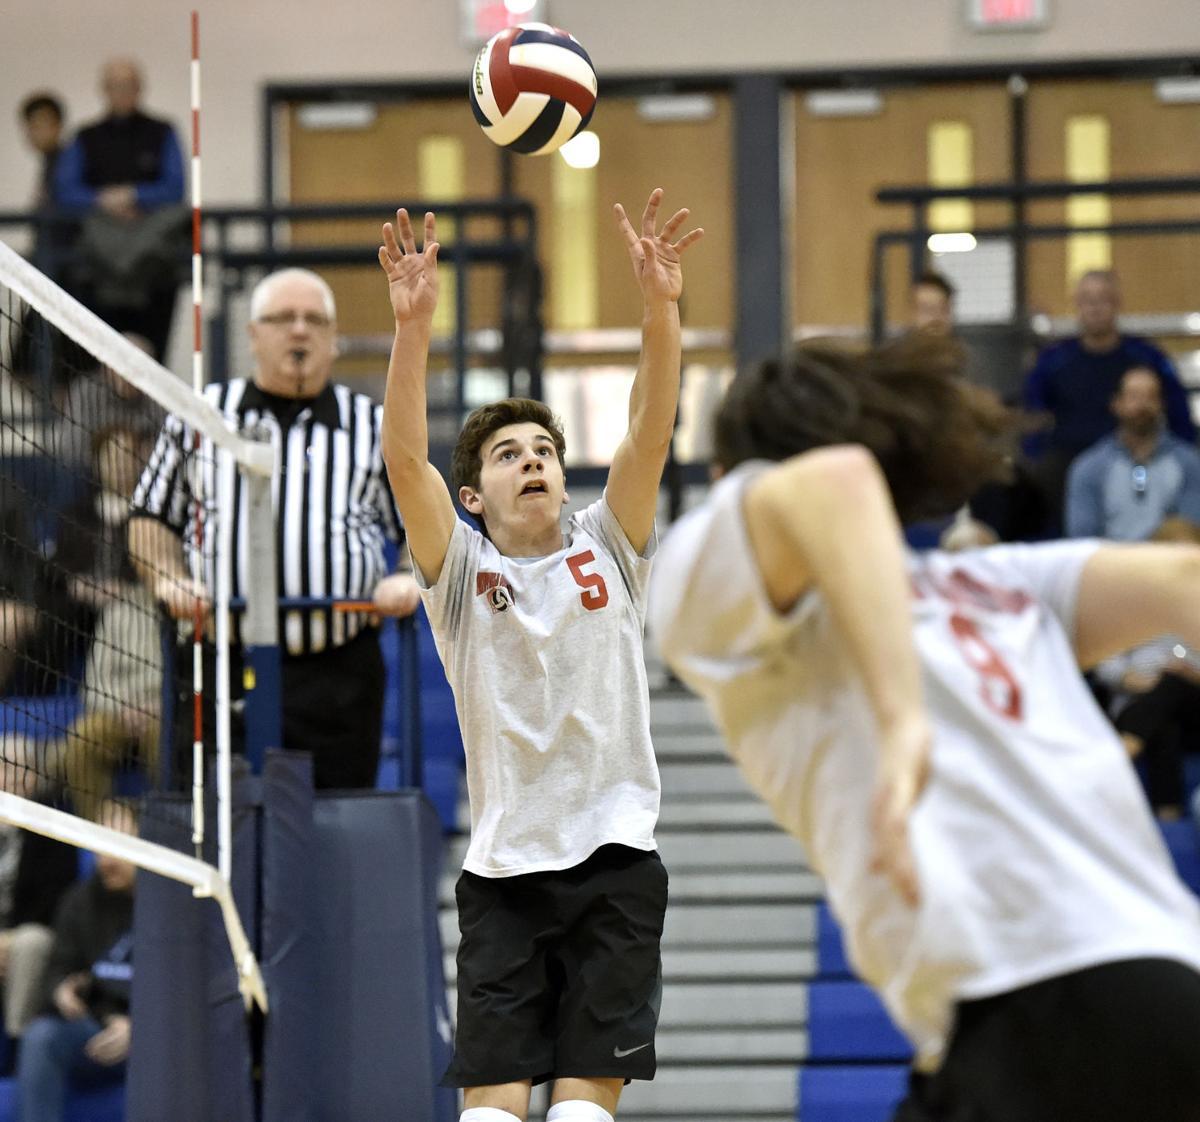 Manheim Twp. vs Hempfield-LL Boys Volleyball